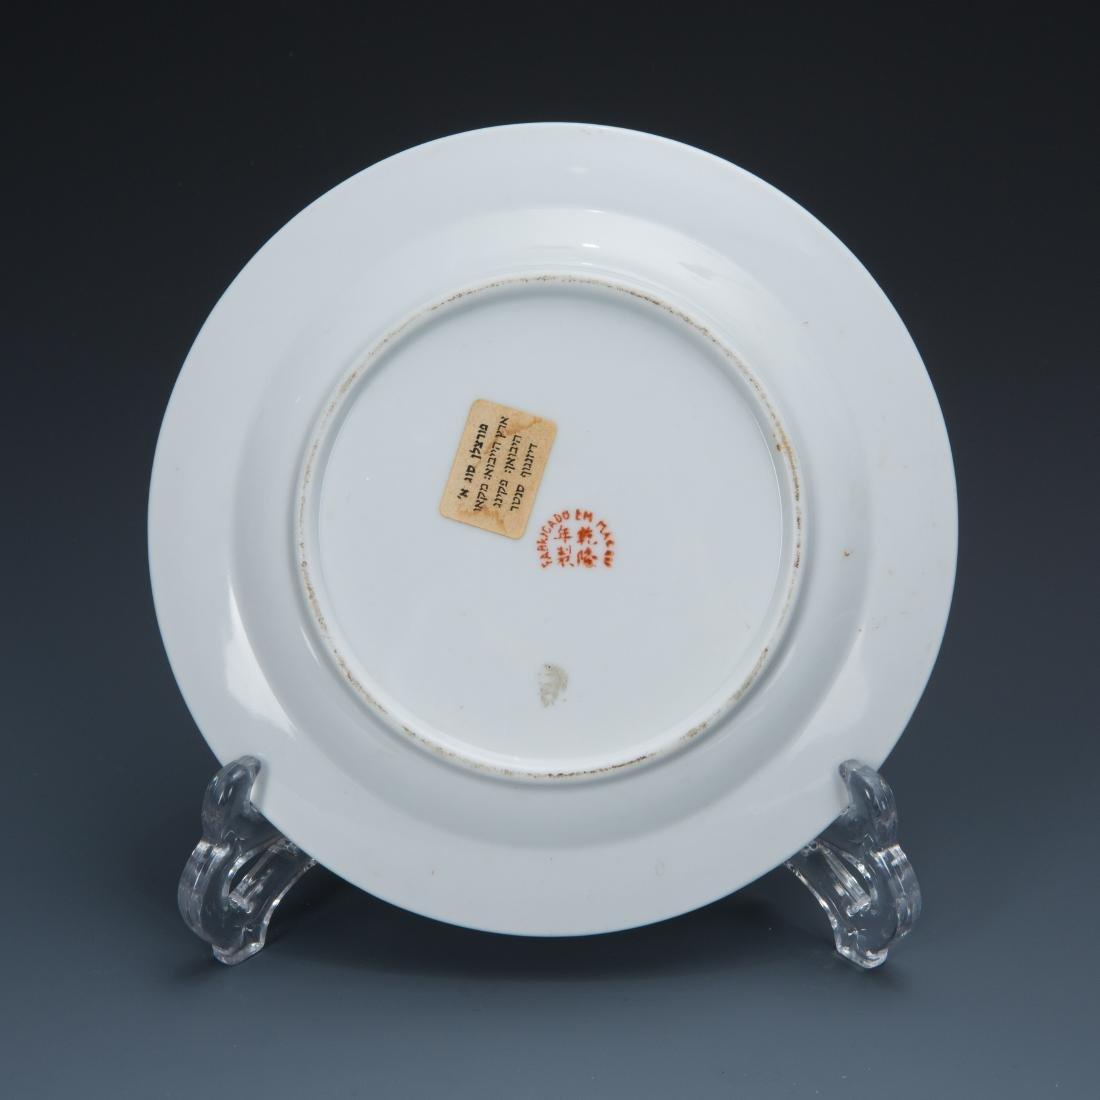 Estate Sale: 3pc Set of Porcelain Plates and Disk - 5